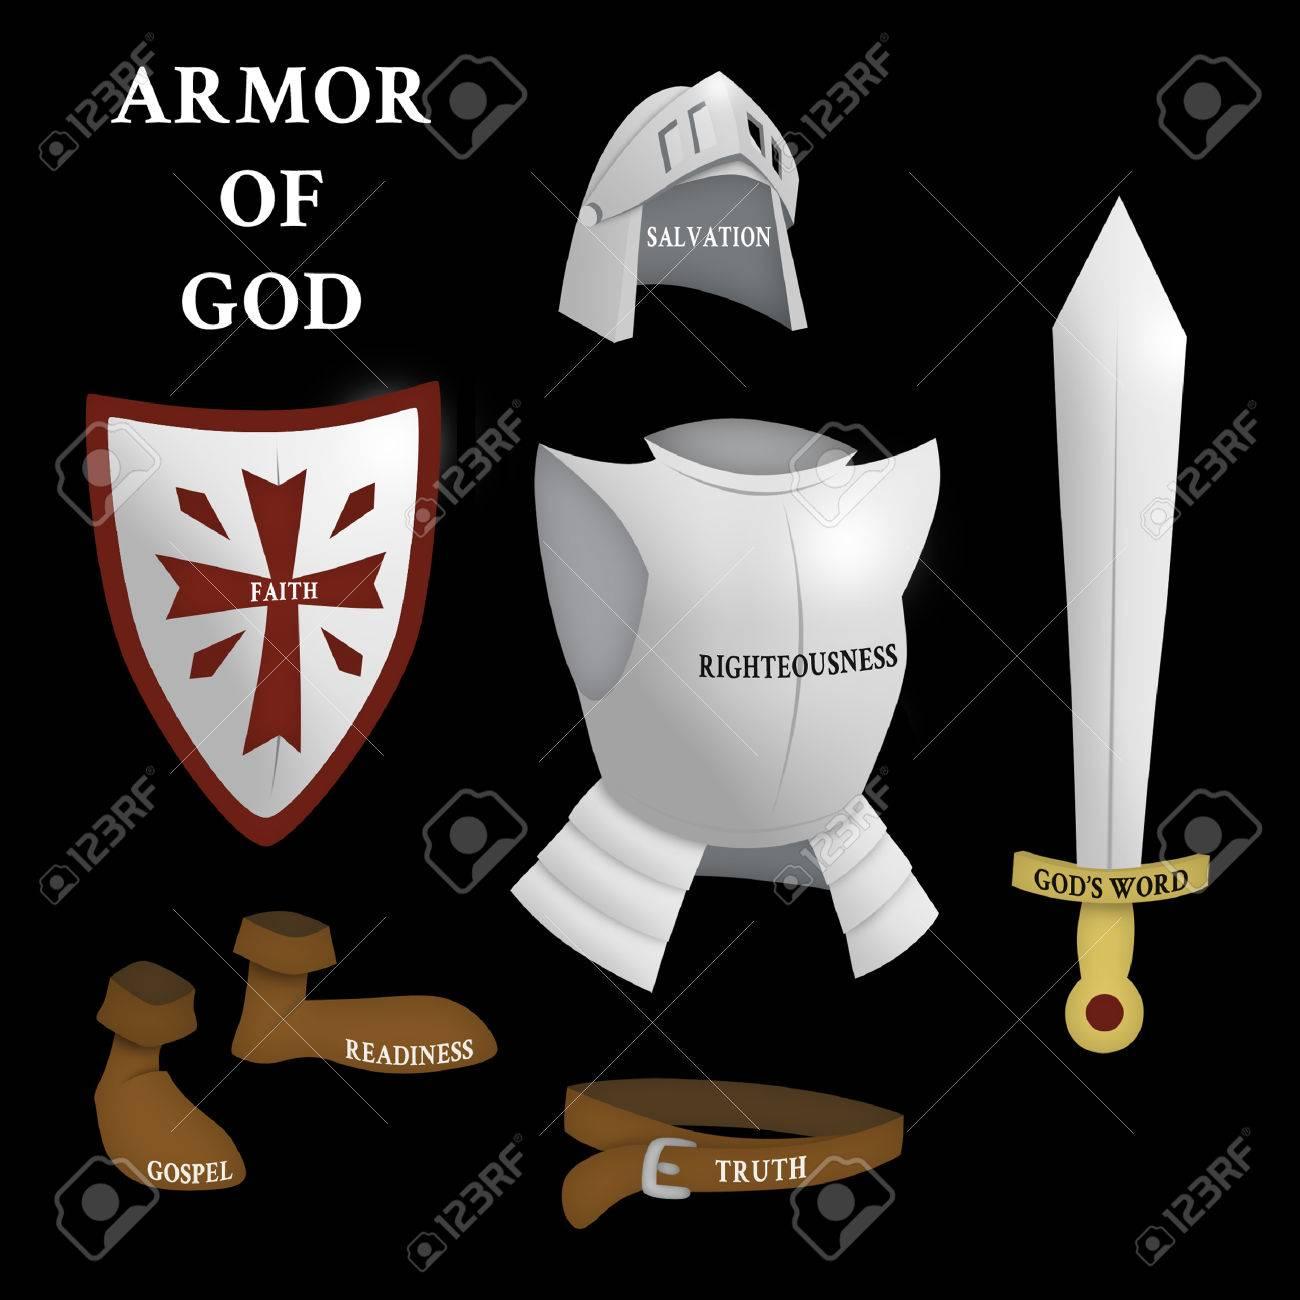 Armor of God, Ephesians 6:13-17 - 83545344